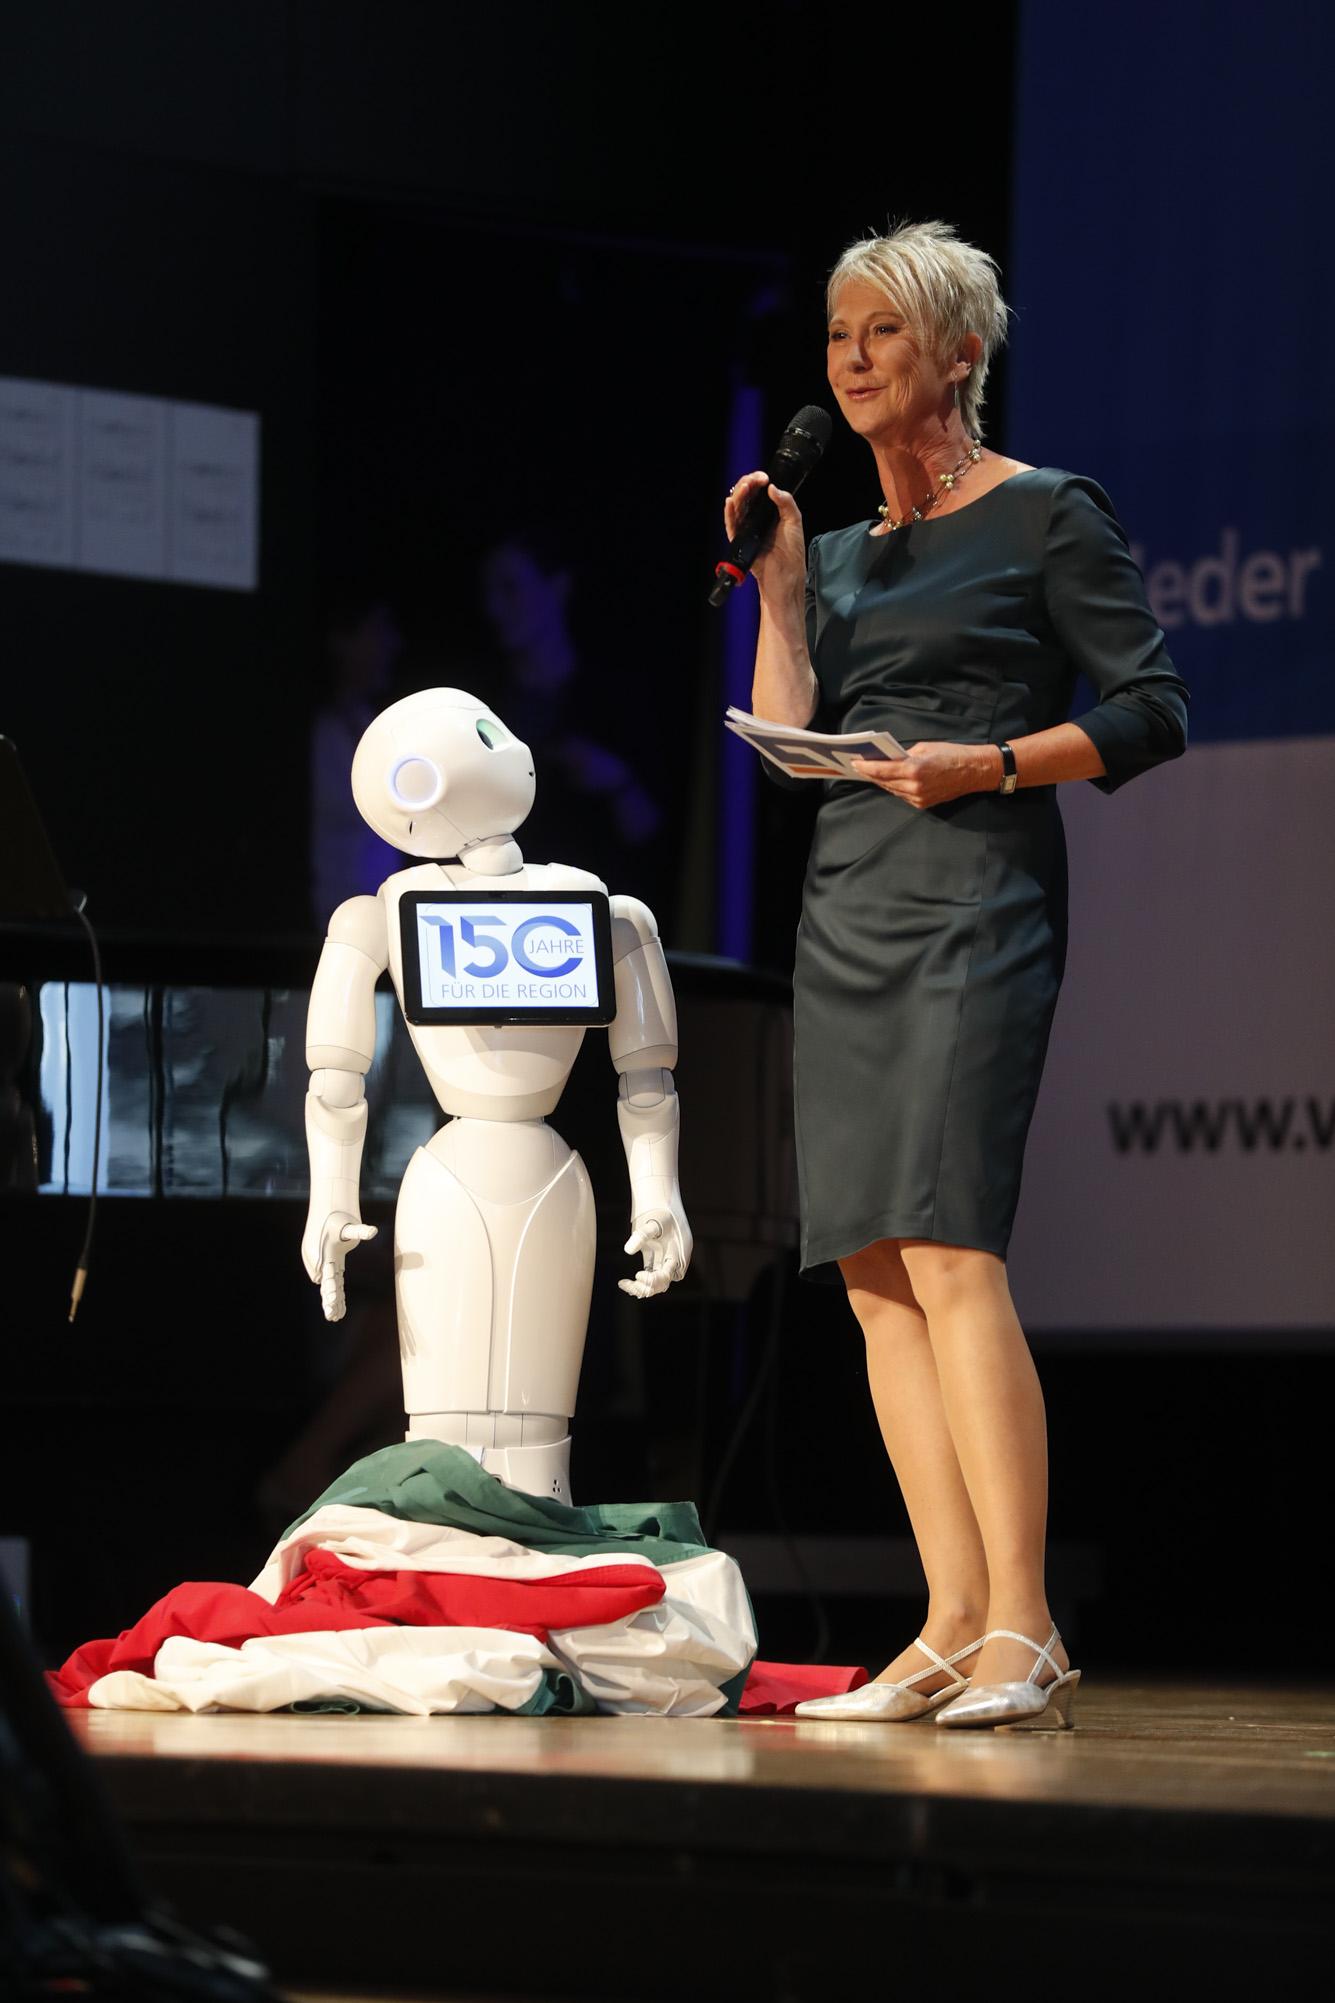 "Moderation der Jubiläums-Gala ""150 Jahre Volksbank-Raiffeisenbank Laupheim-Illertal"" im Gespräch mit dem Roboter 'Vrida', Kulturhaus Laupheim, Juni 2018"